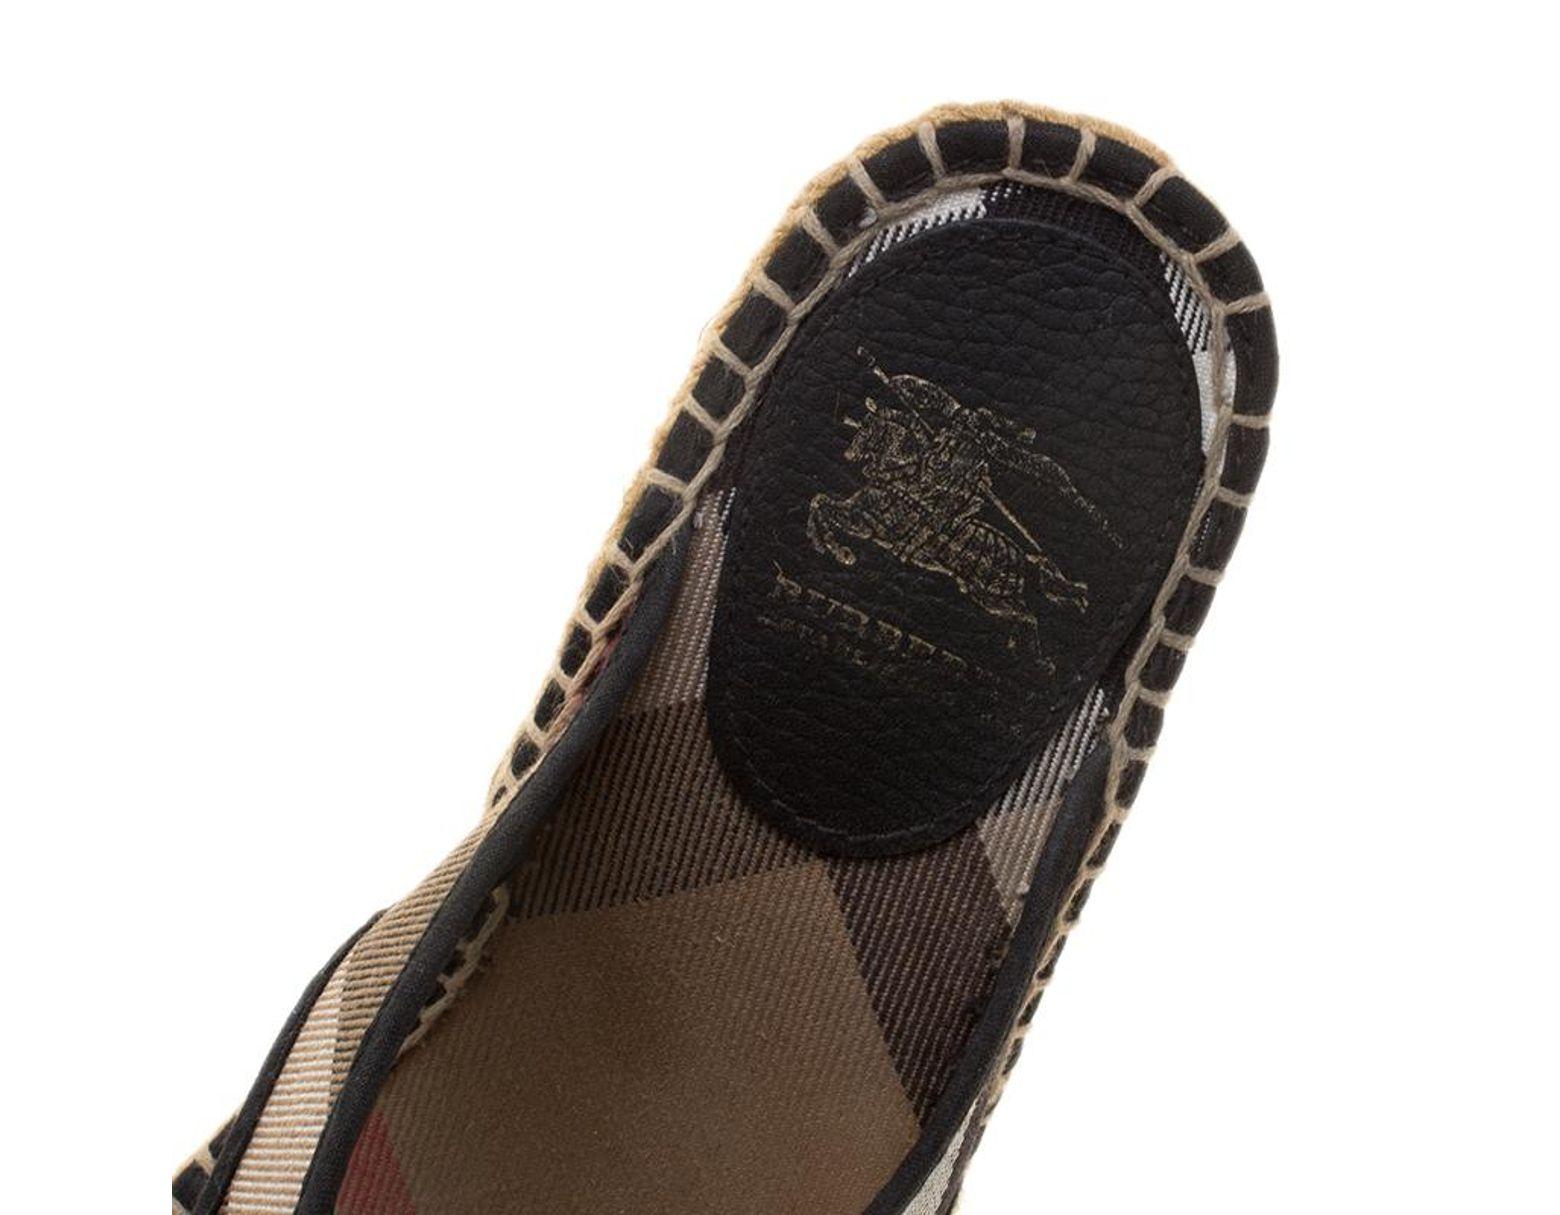 13d759af6 Burberry Black Novacheck Canvas Espadrille Thong Wedge Sandals Size 35 in  Black - Lyst